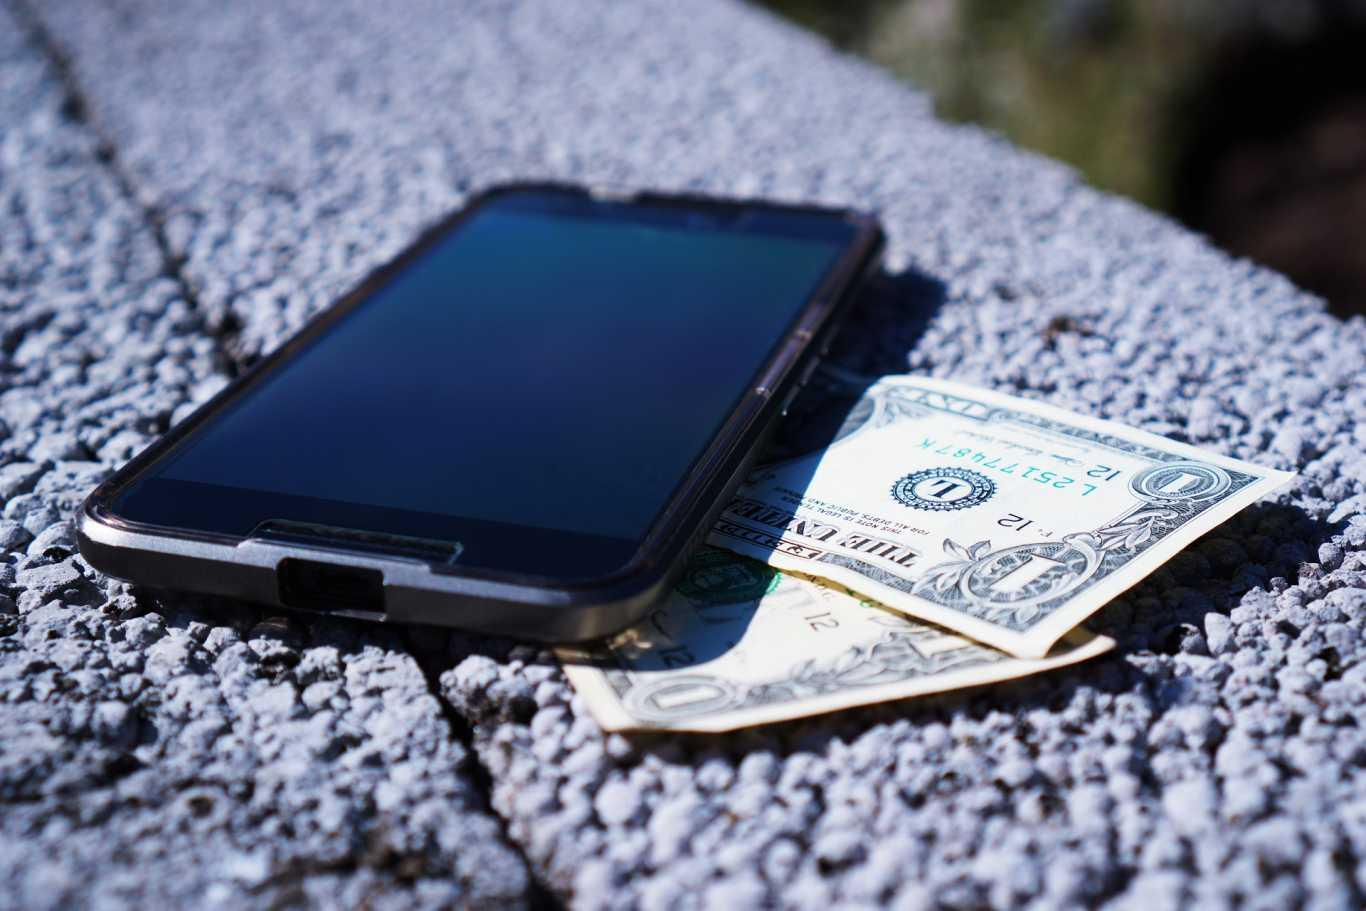 Mobile app download